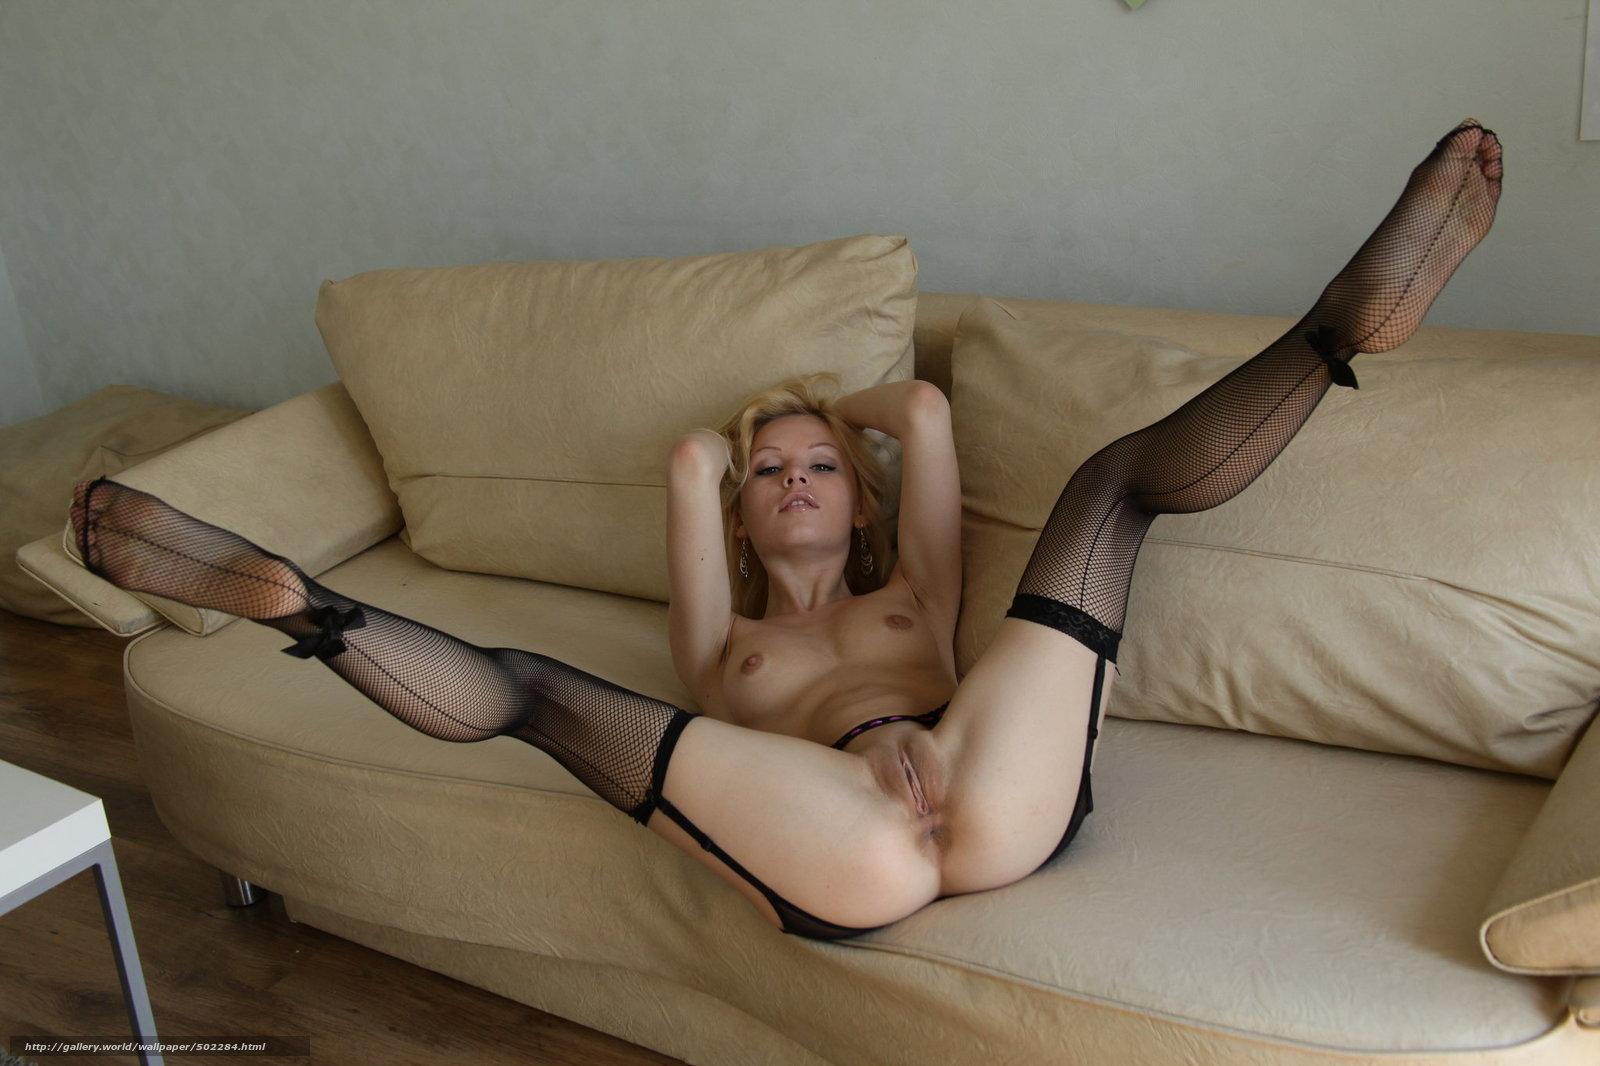 Раздвинула ноги раком фото эро 12 фотография